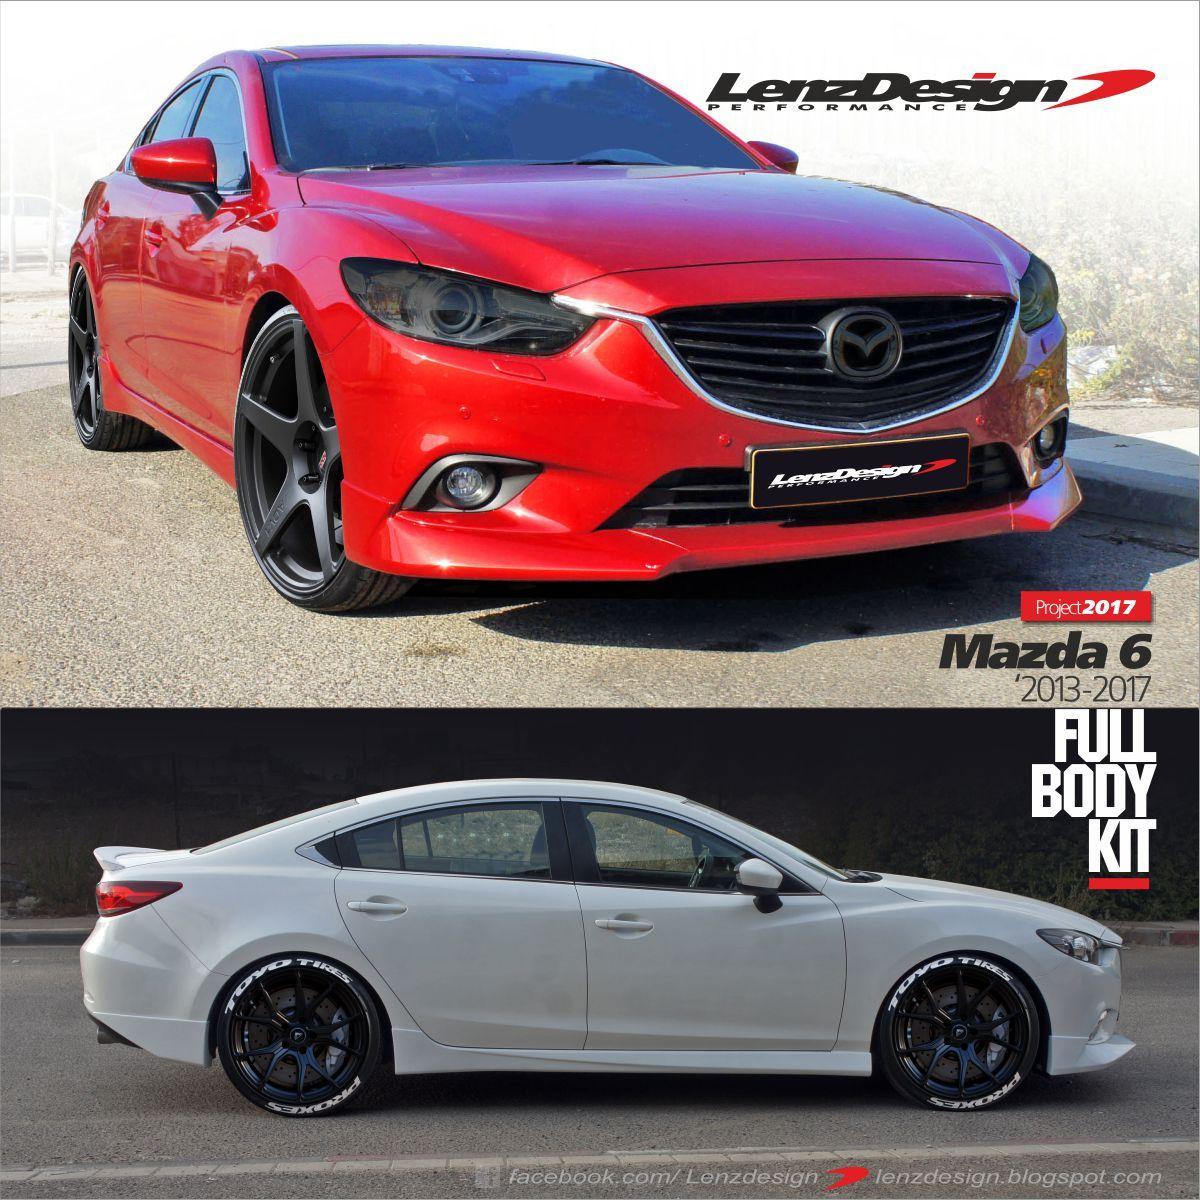 Facebook Com Lenzdesign Http Lenzdesign Blogspot Com Mazda 6 Mazda Mazda 6 2017